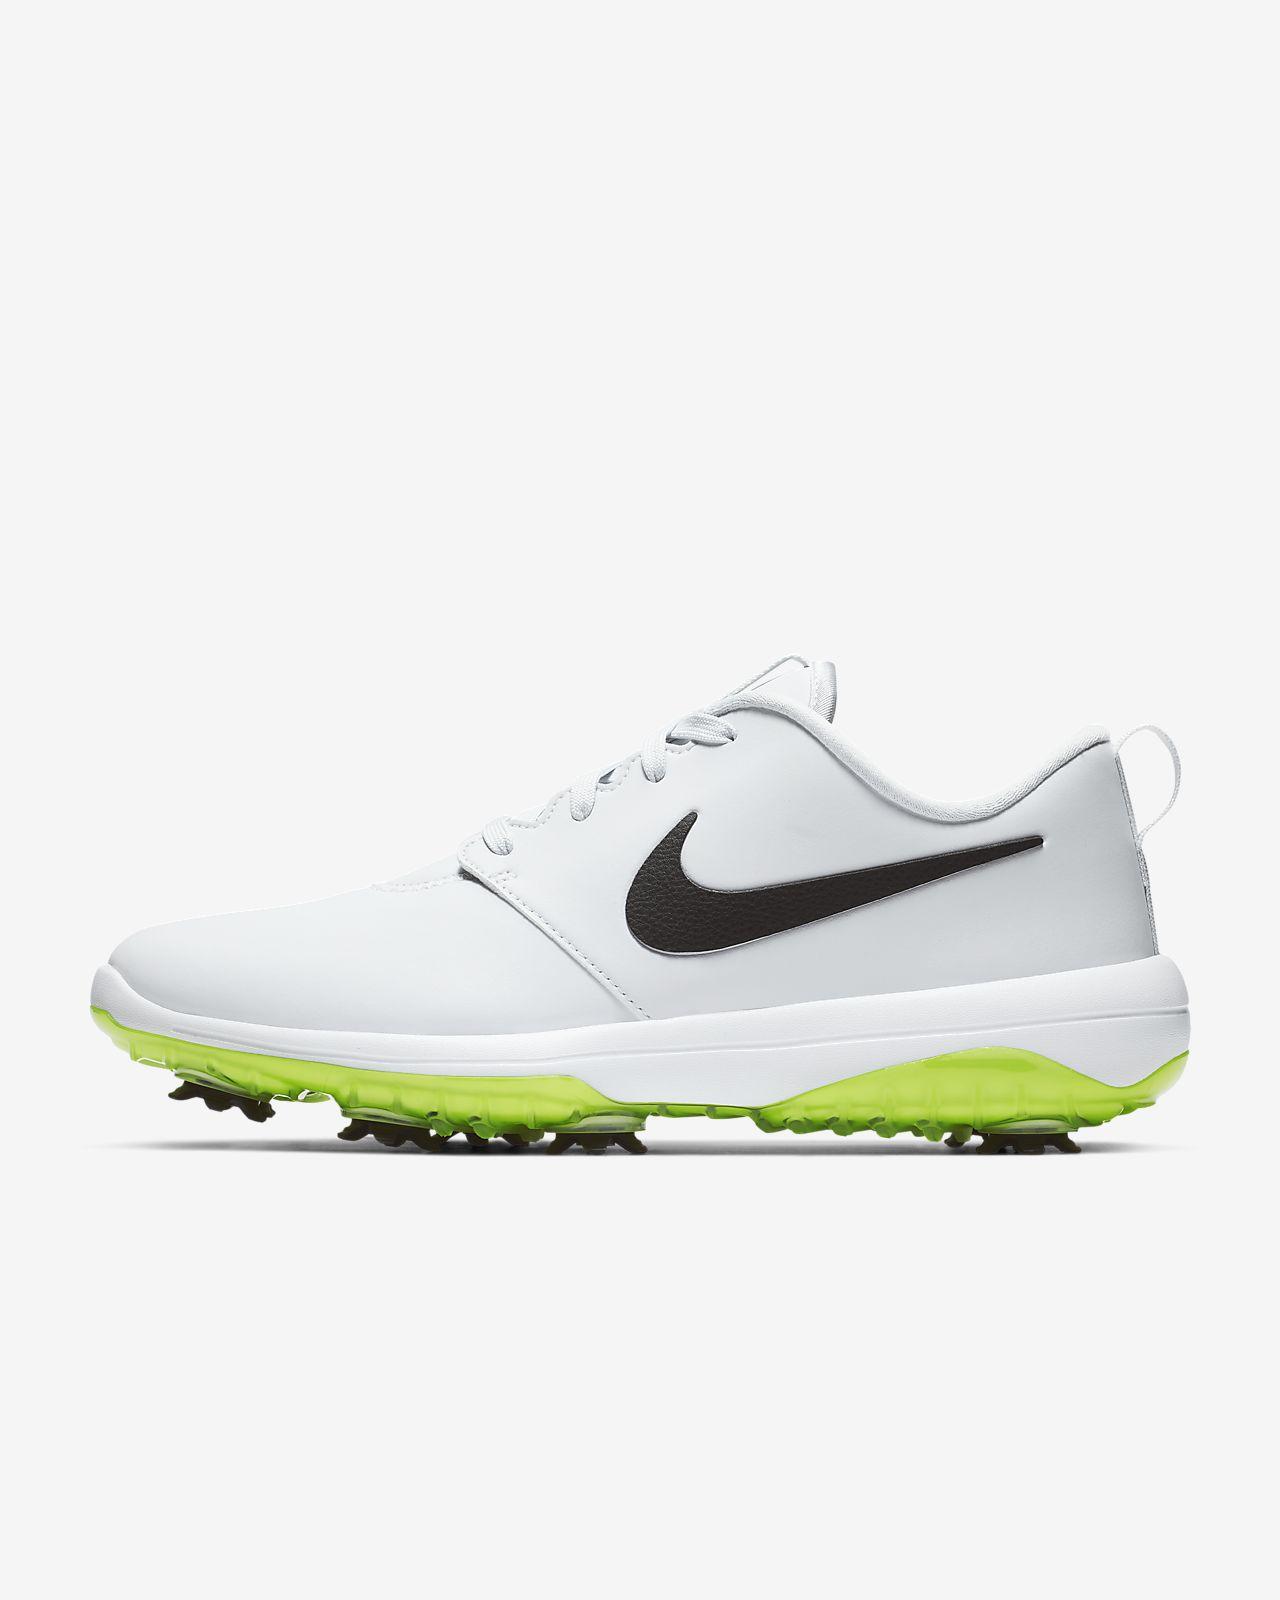 438c8bf8 Мужские кроссовки для гольфа Nike Roshe G Tour. Nike.com RU